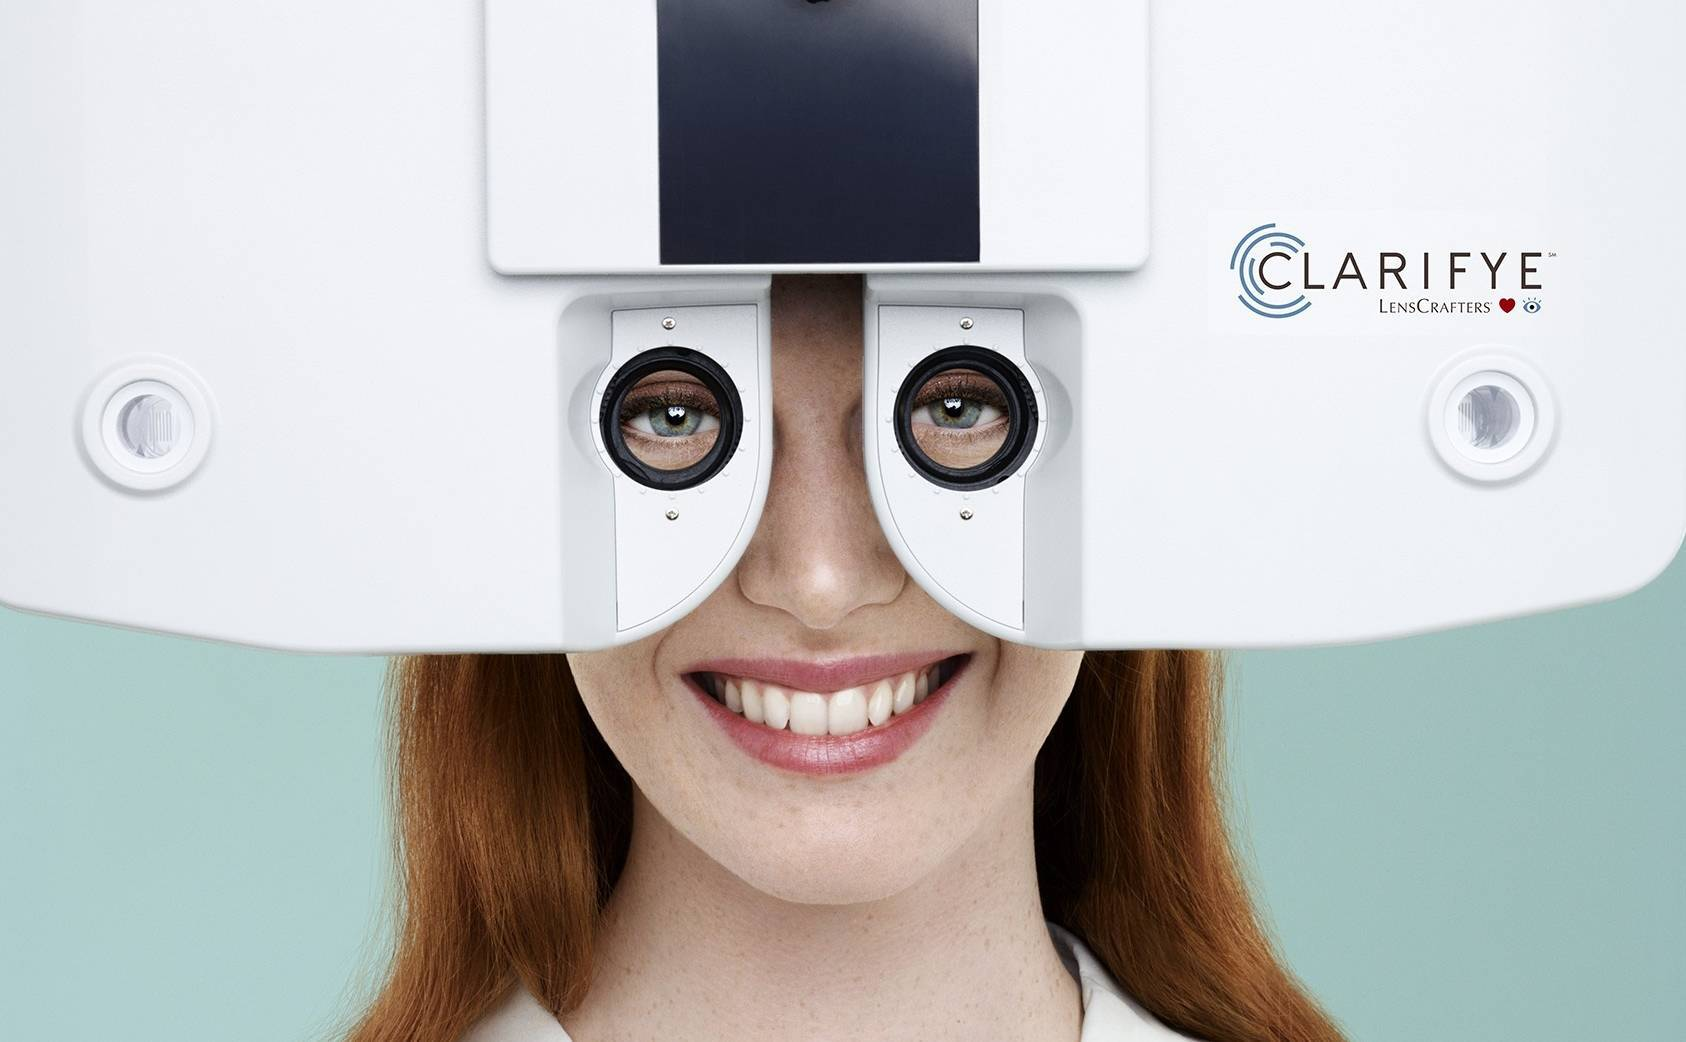 Clarifye-Brand-Image-Female-FINAL-12-15-15